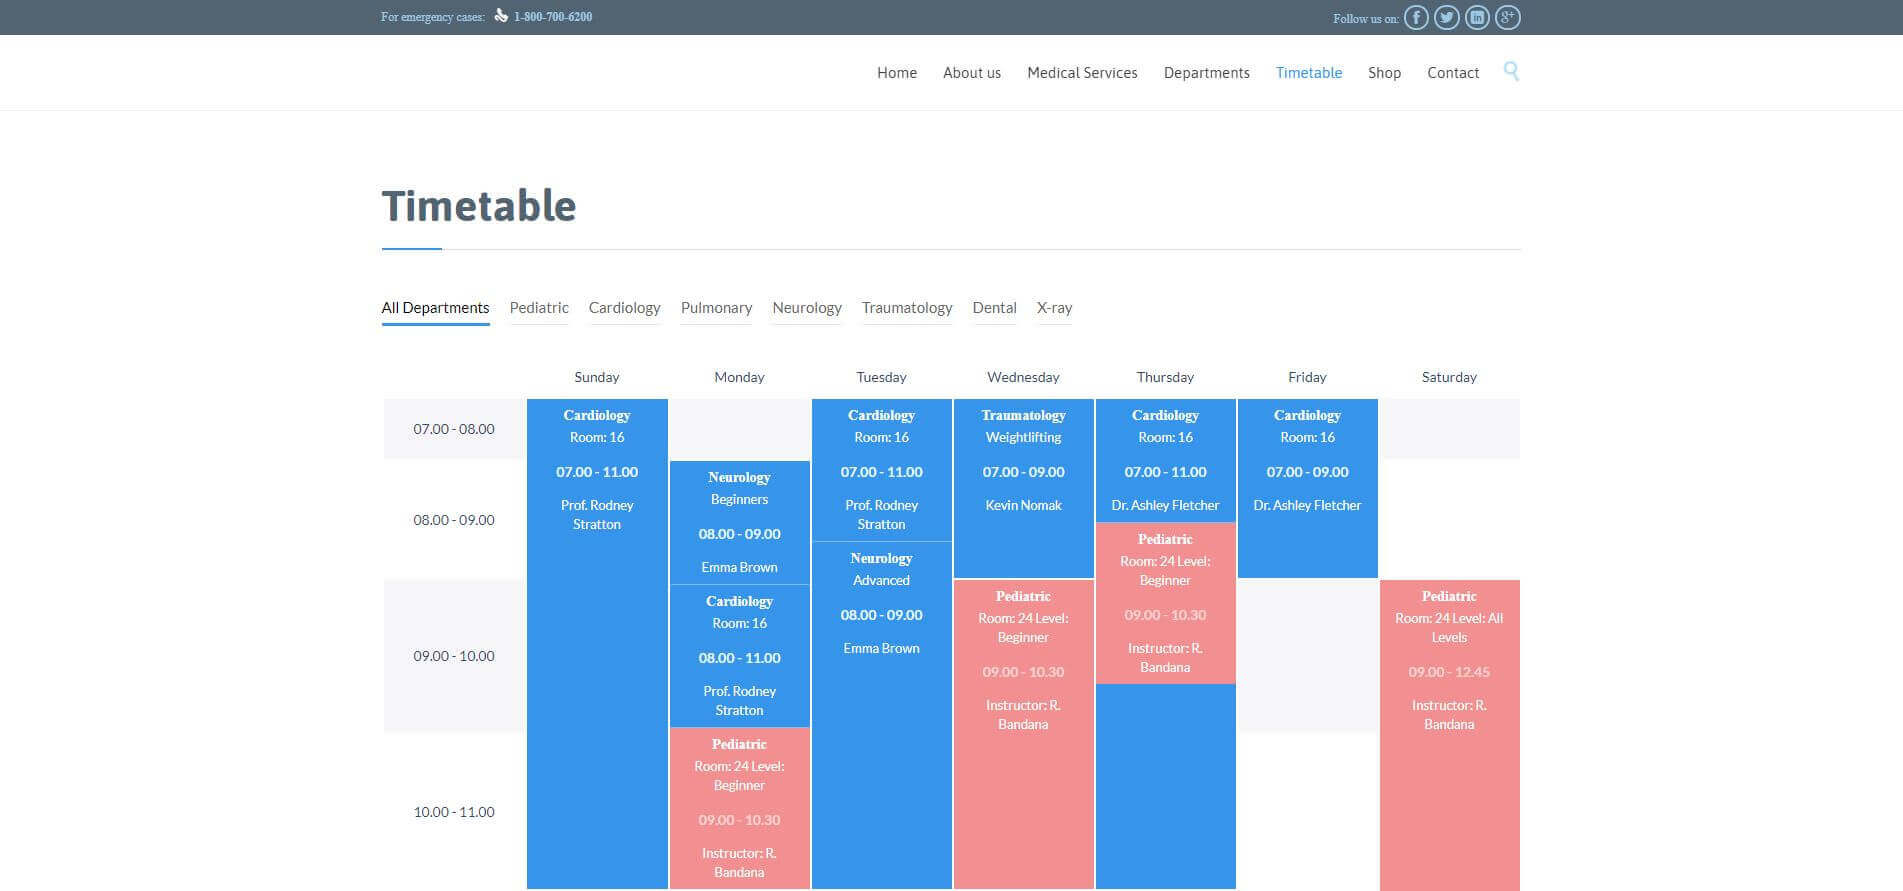 HealthCare Website - Online TimeTable